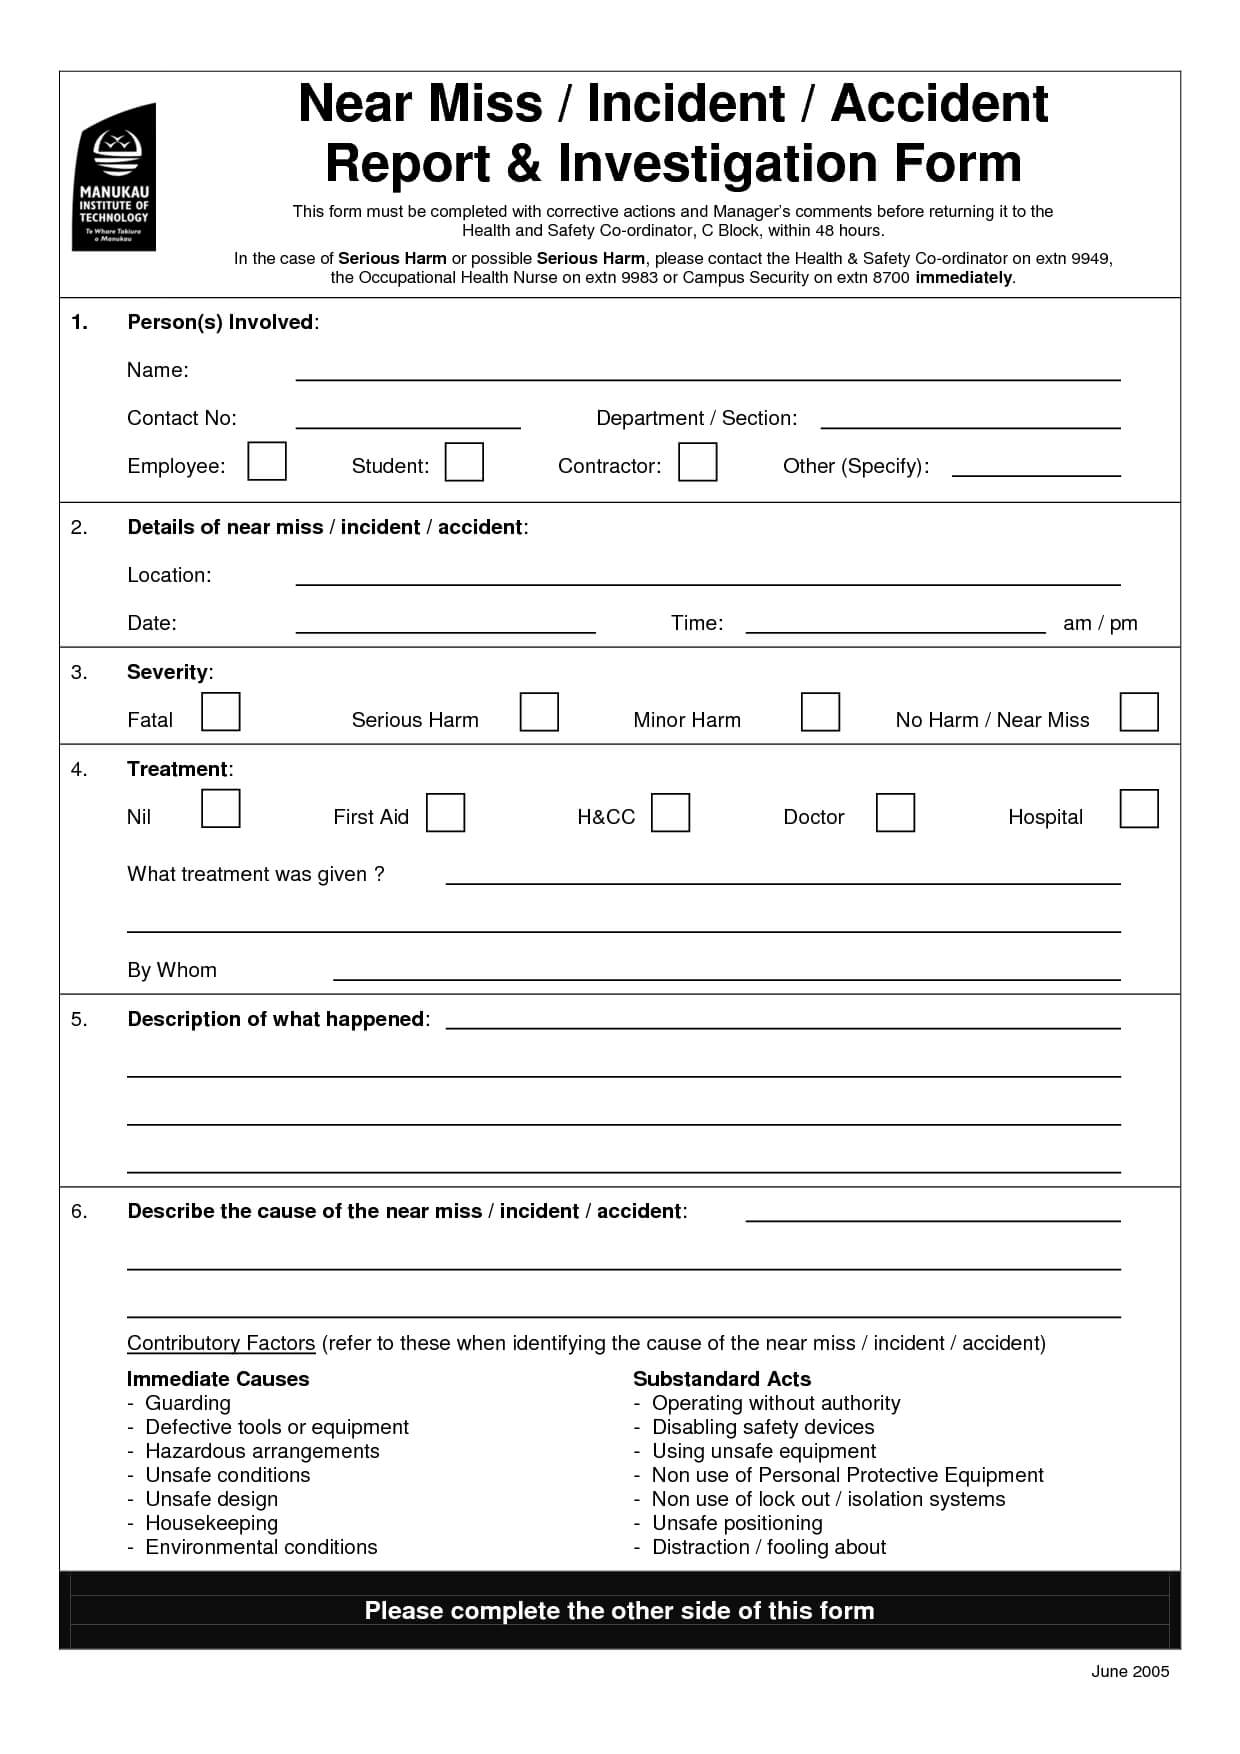 Traffic Ident Investigation Report Format Form Hse Incident Pertaining To Investigation Report Template Doc